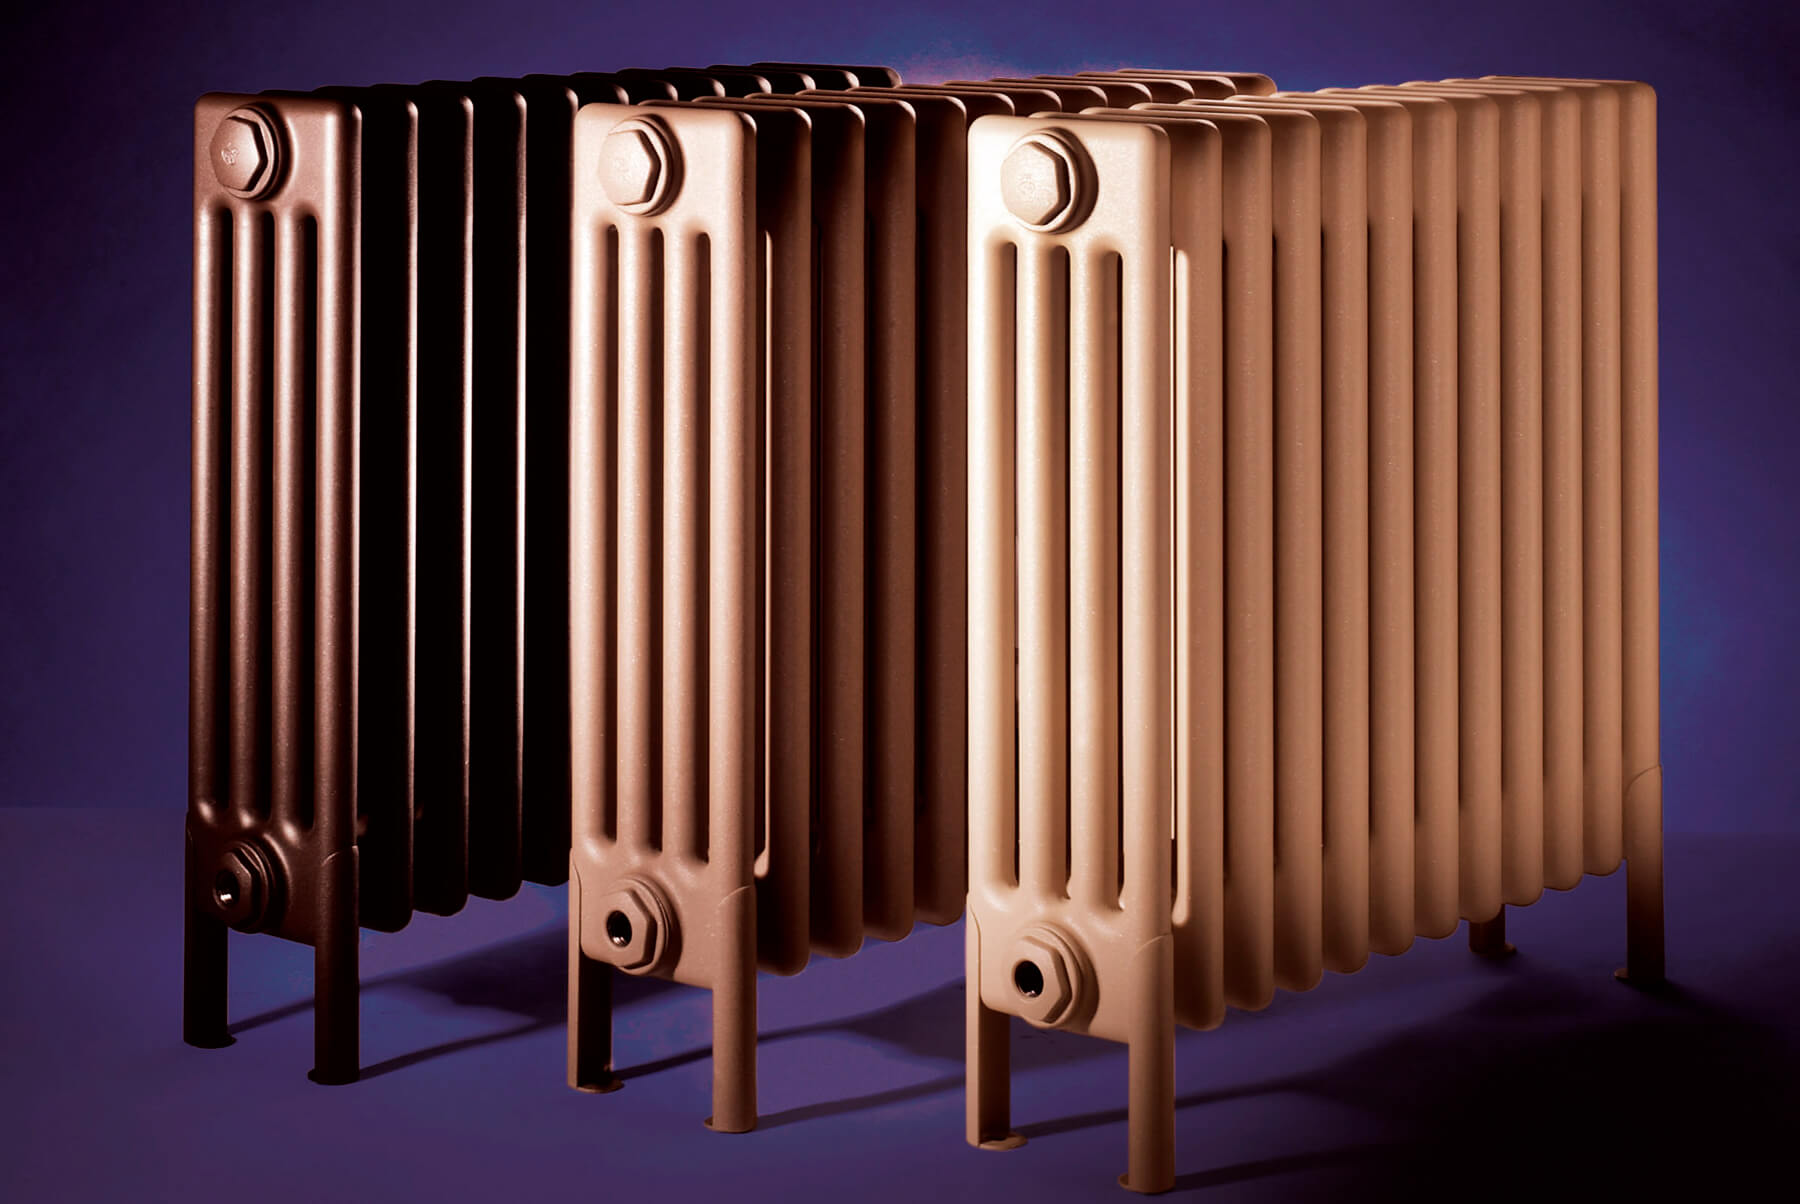 Radiators-&-Towel-Warmers-BISQUE-CLASSIC-INSET-4-1800x1204